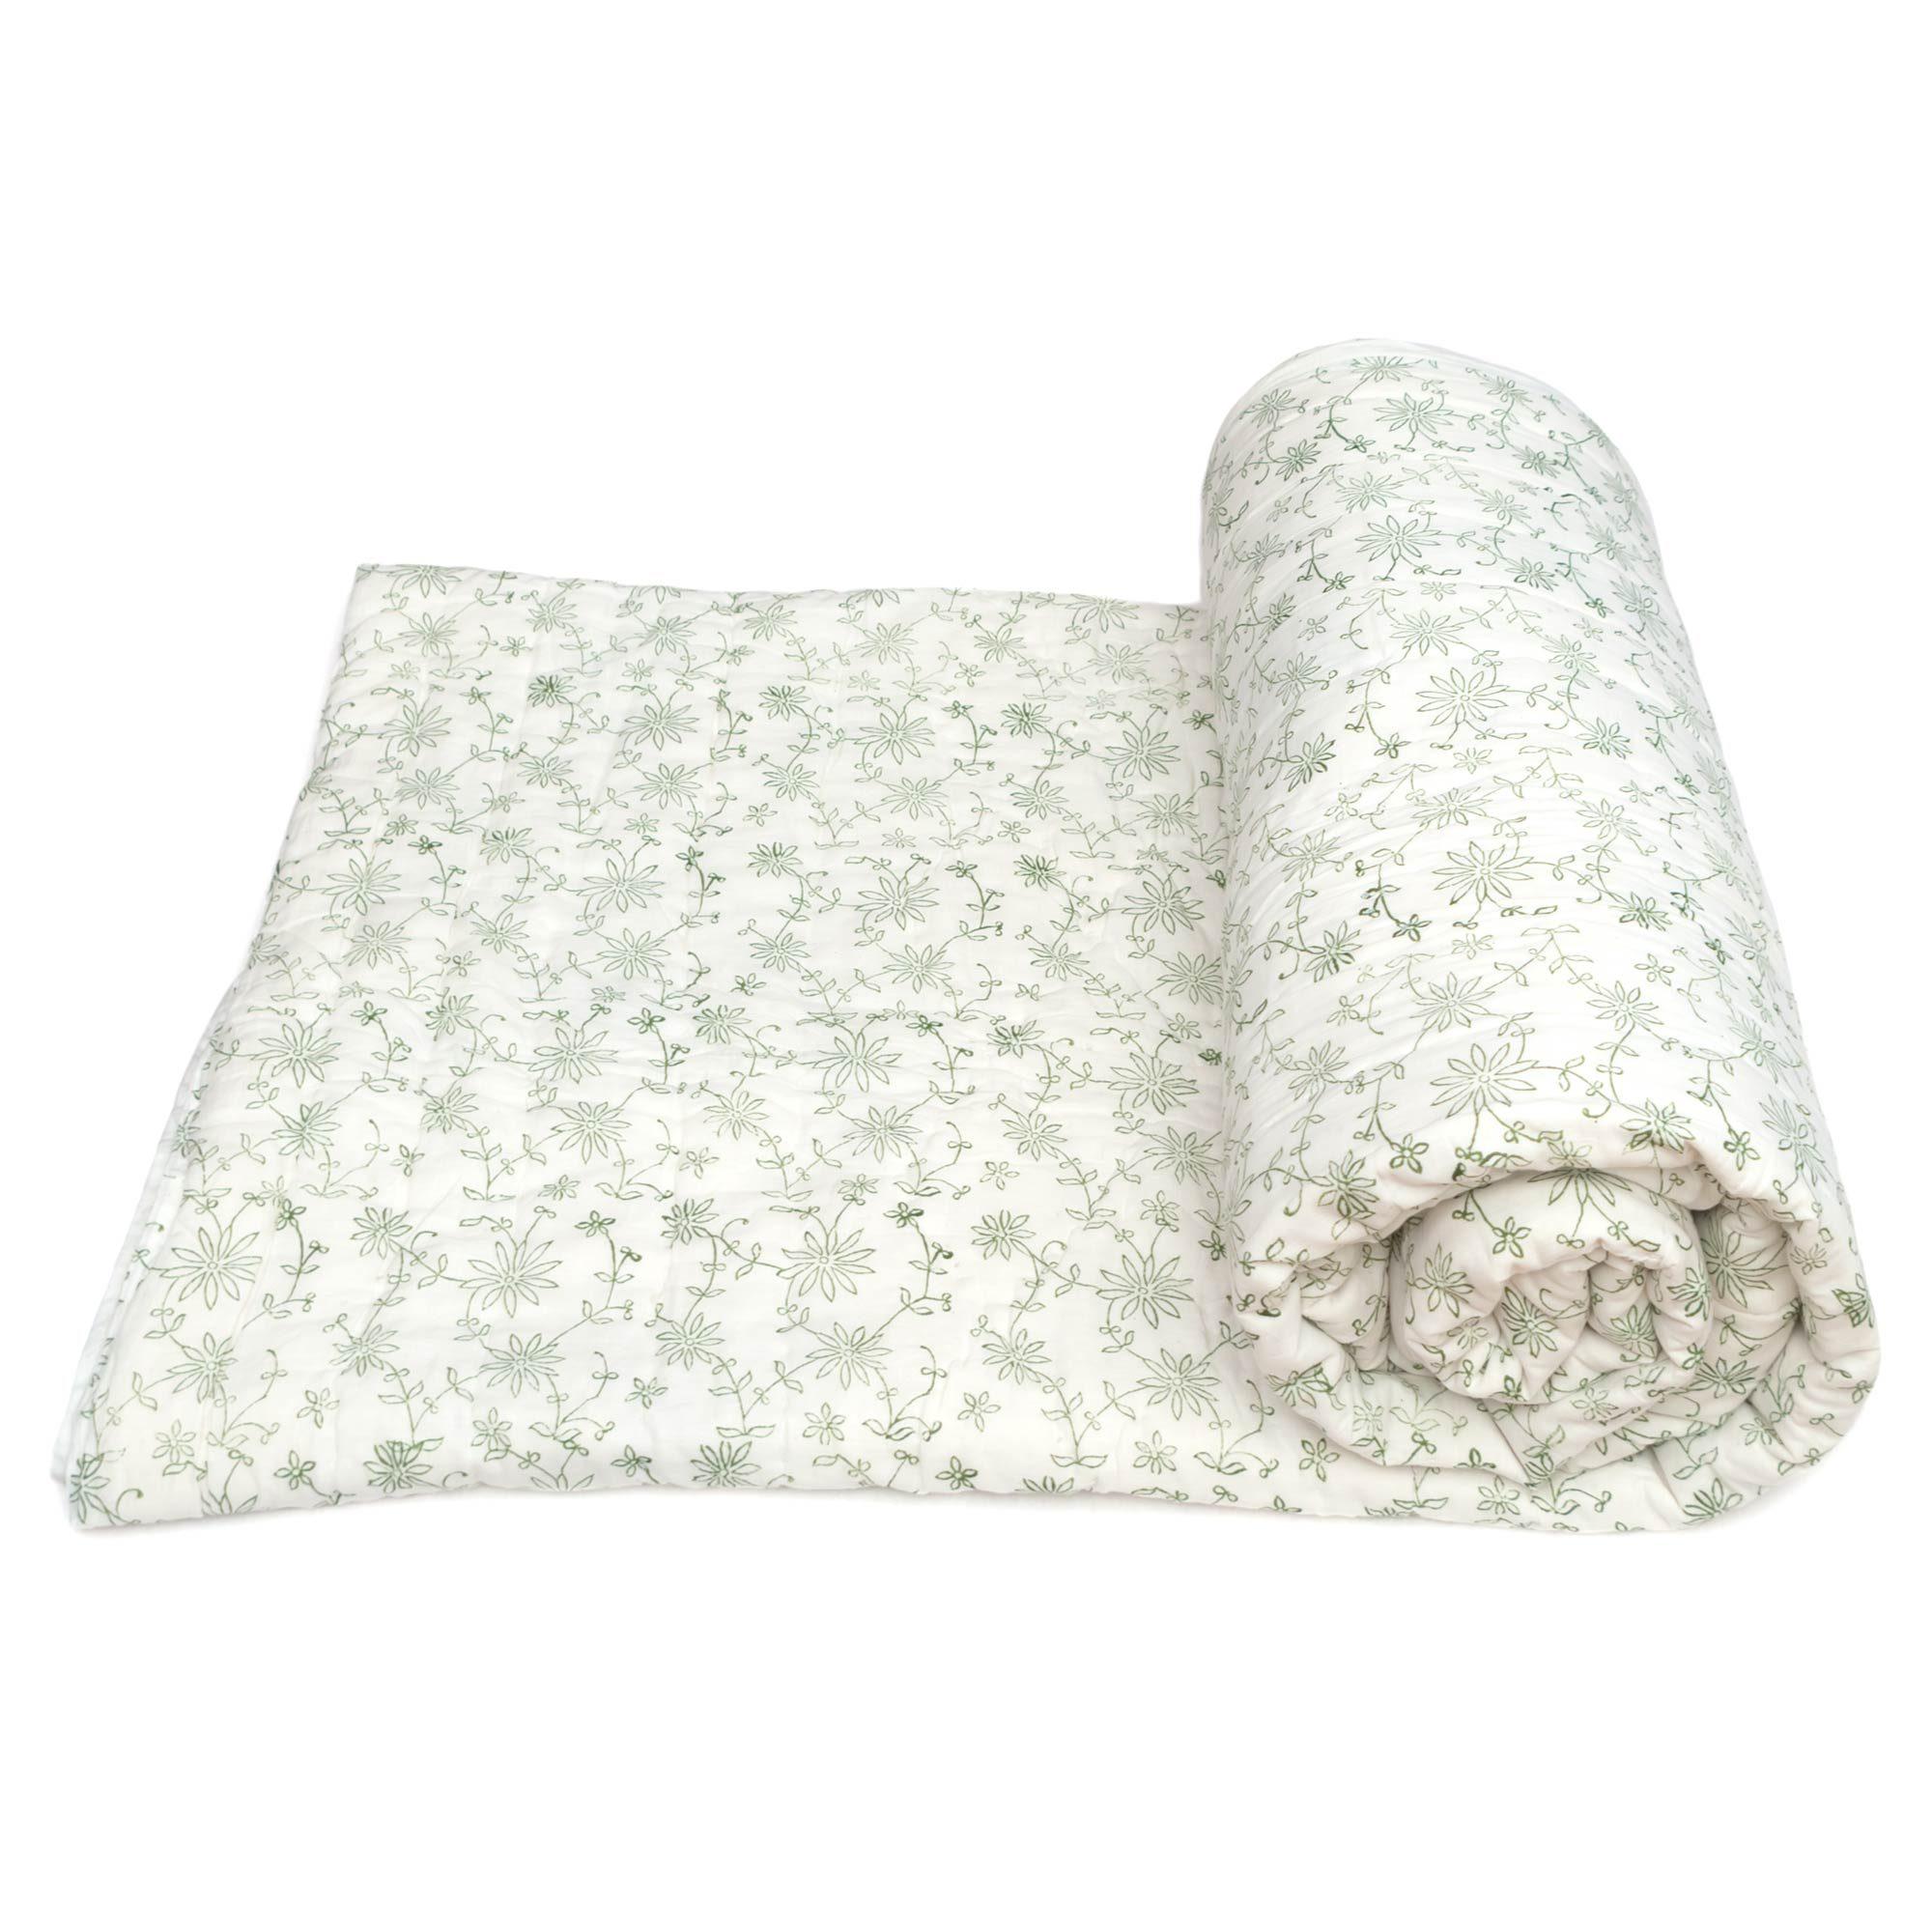 Tara-Textile - indische Decke - Sommerdecke Anoka